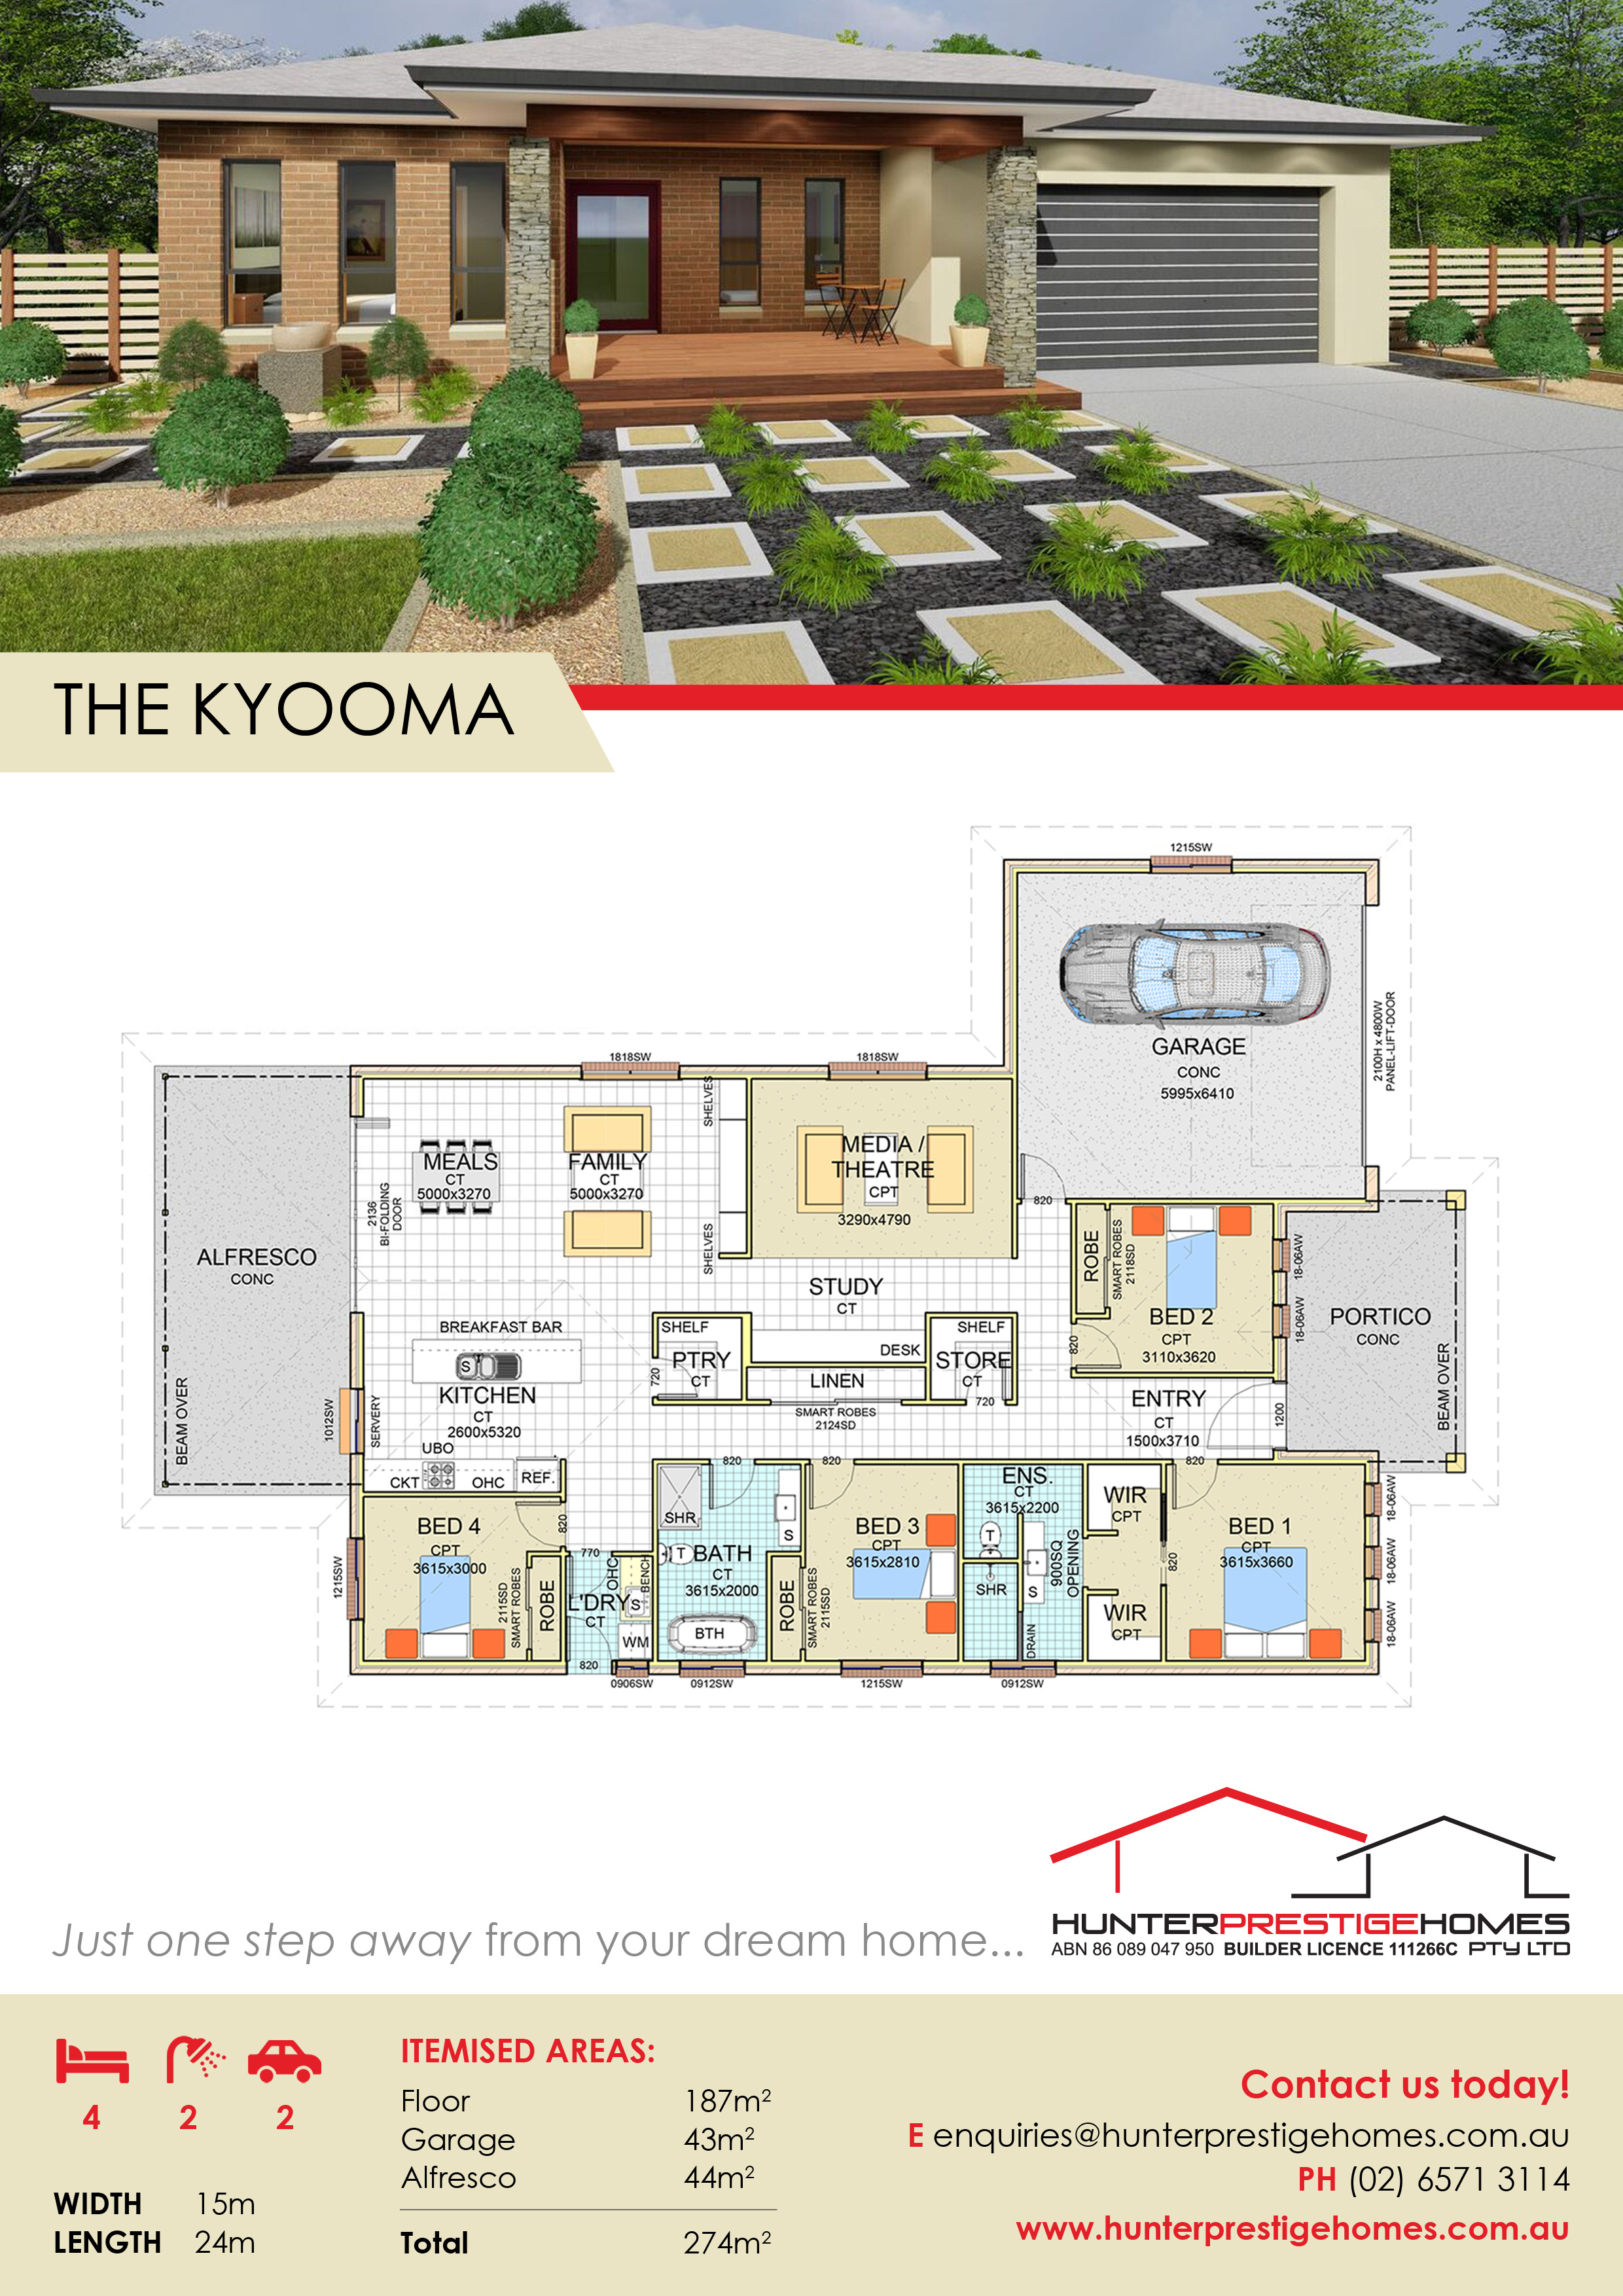 Kyooma_HPH_Brochure